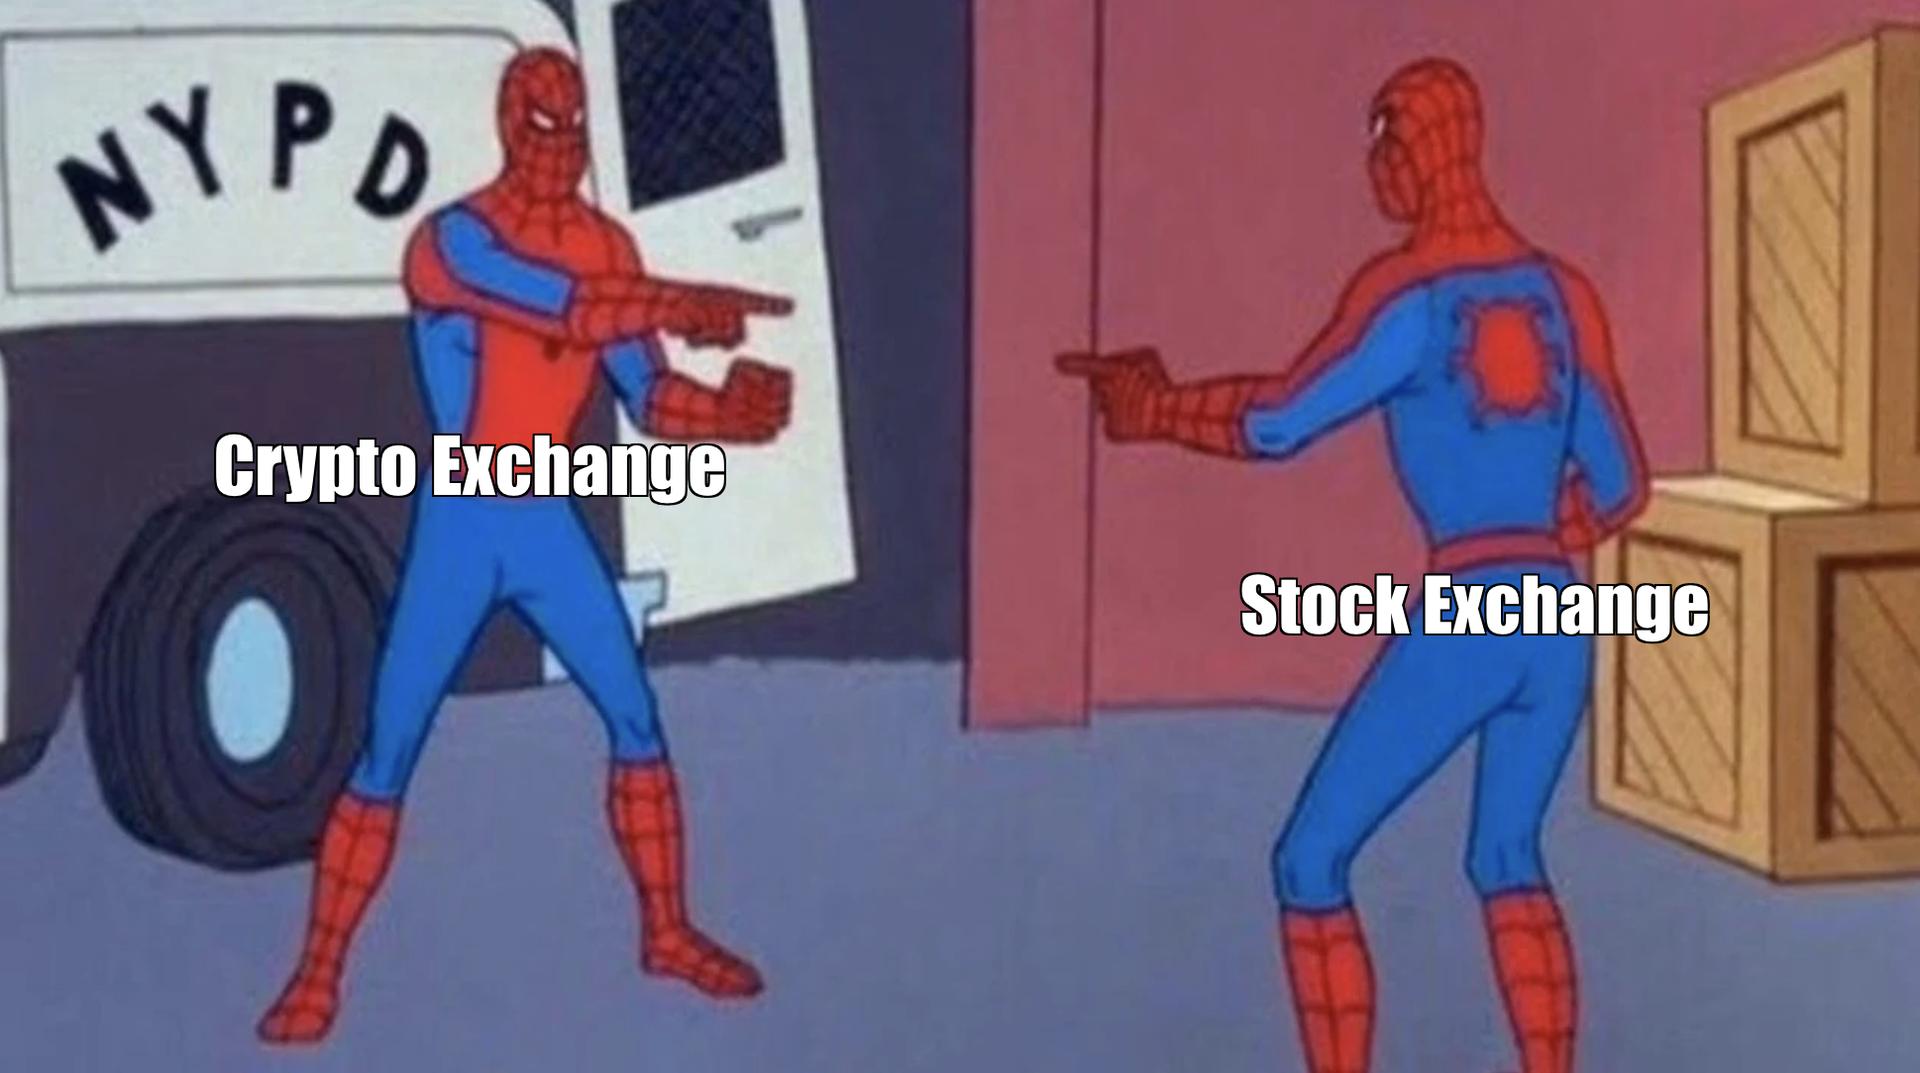 Crypto Exchange and Stock Exchange